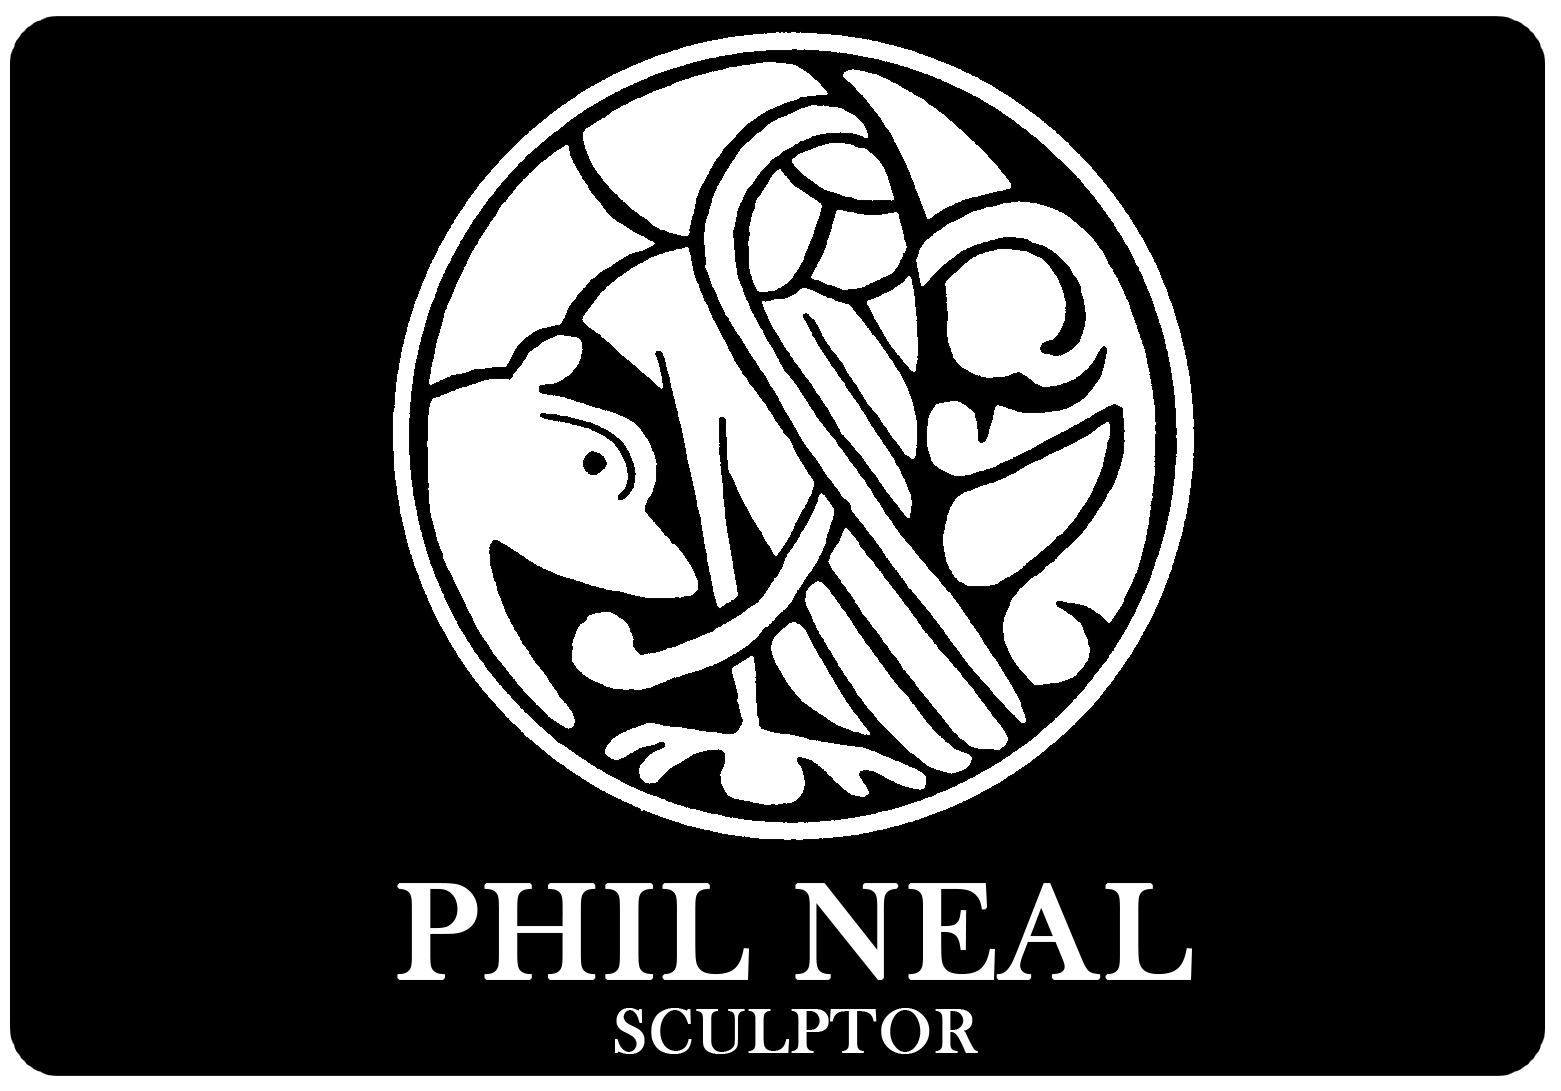 Phil Neal Sculptor